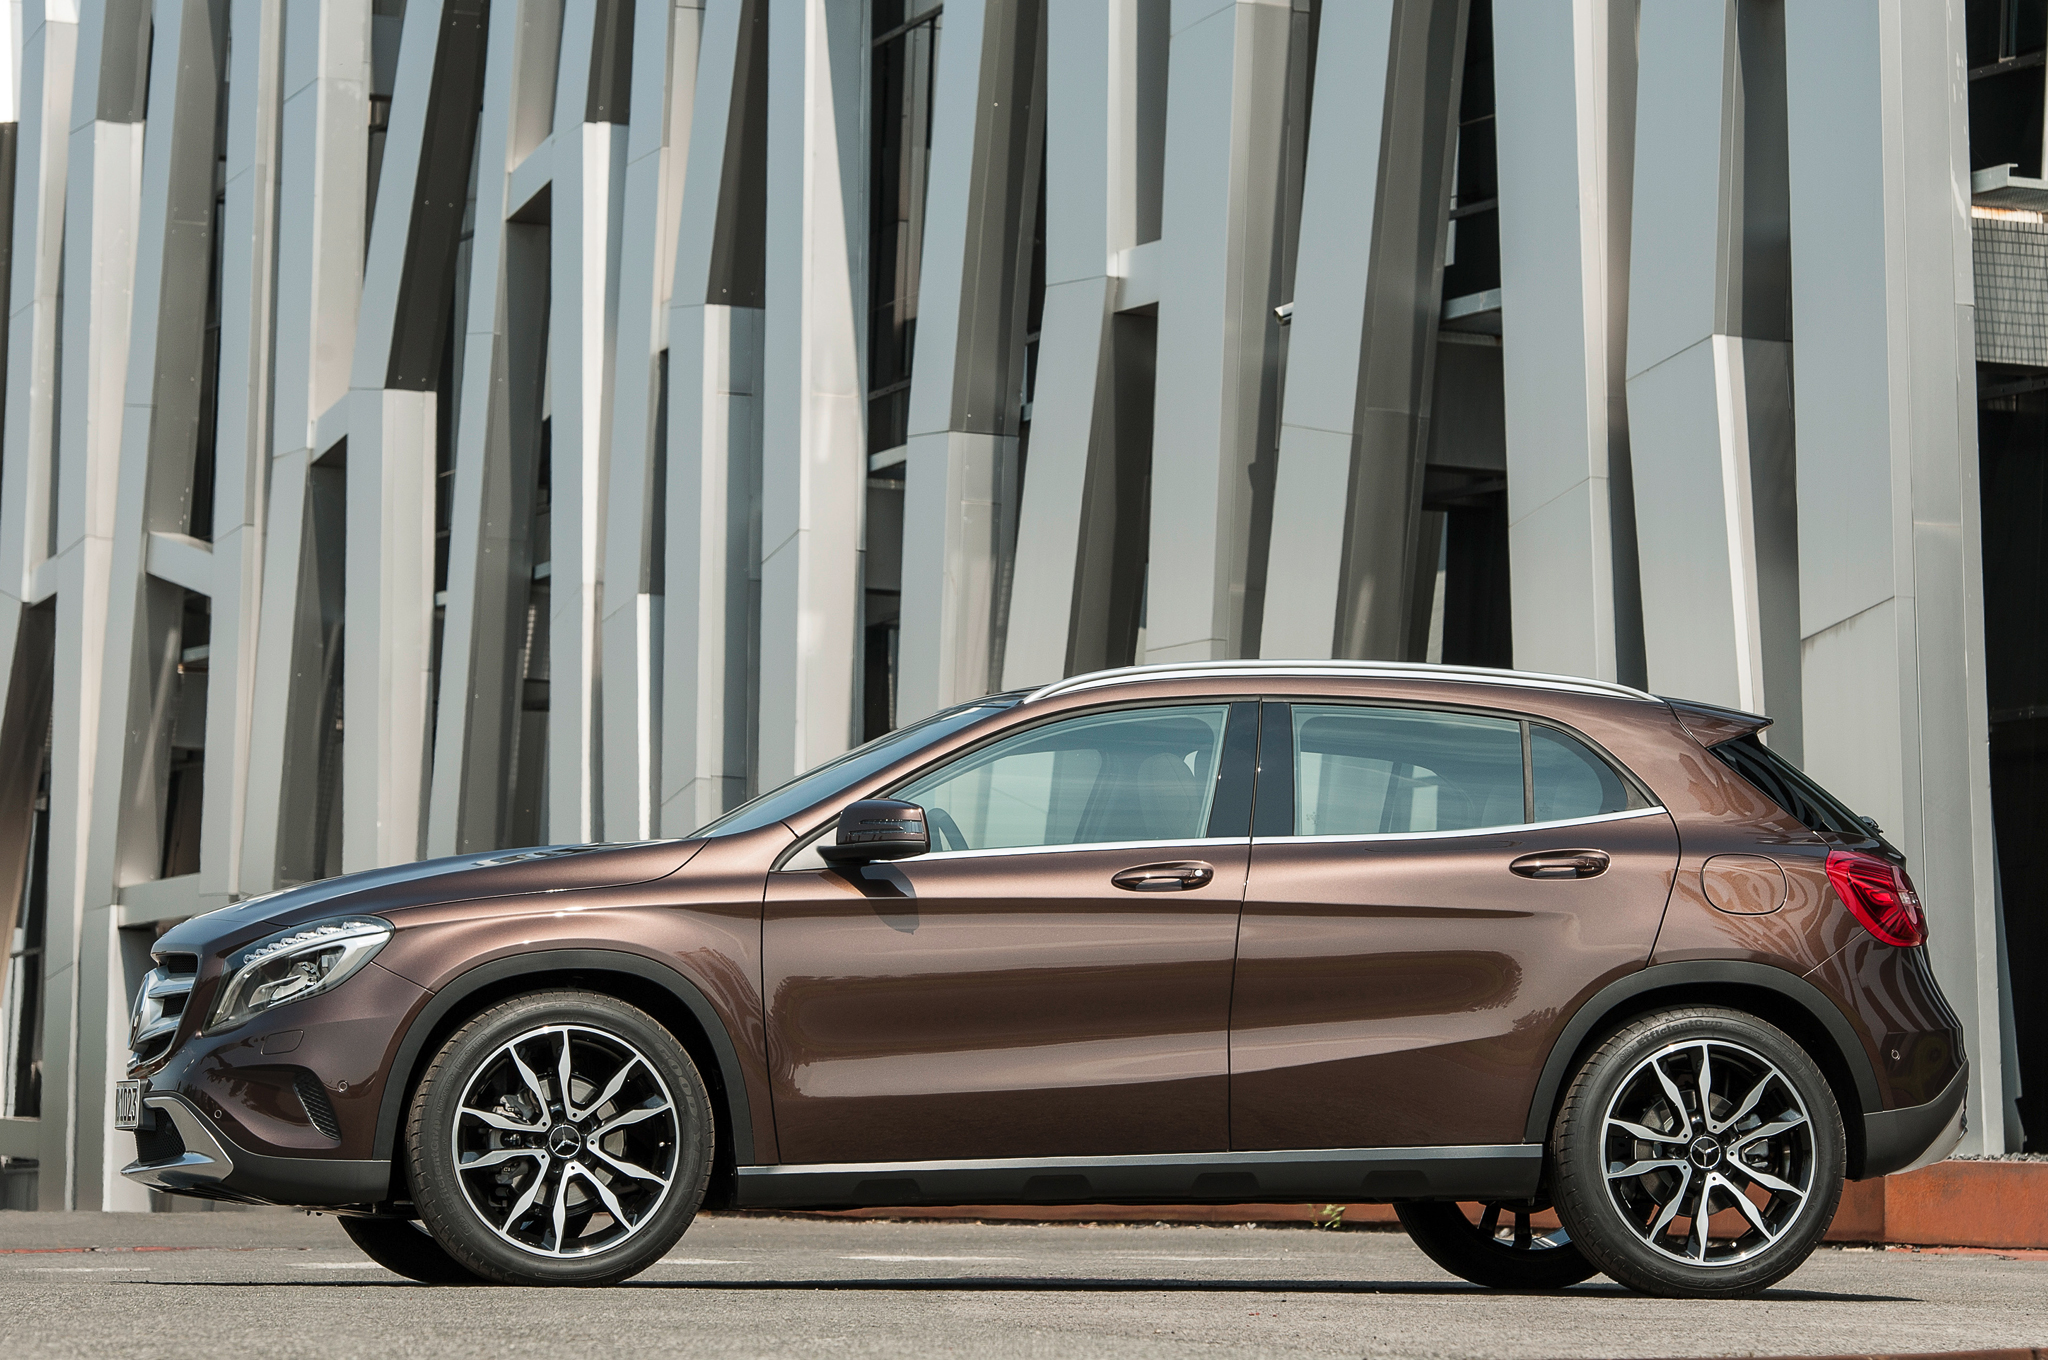 2015 Mercedes-Benz GLA-Class Side Design View